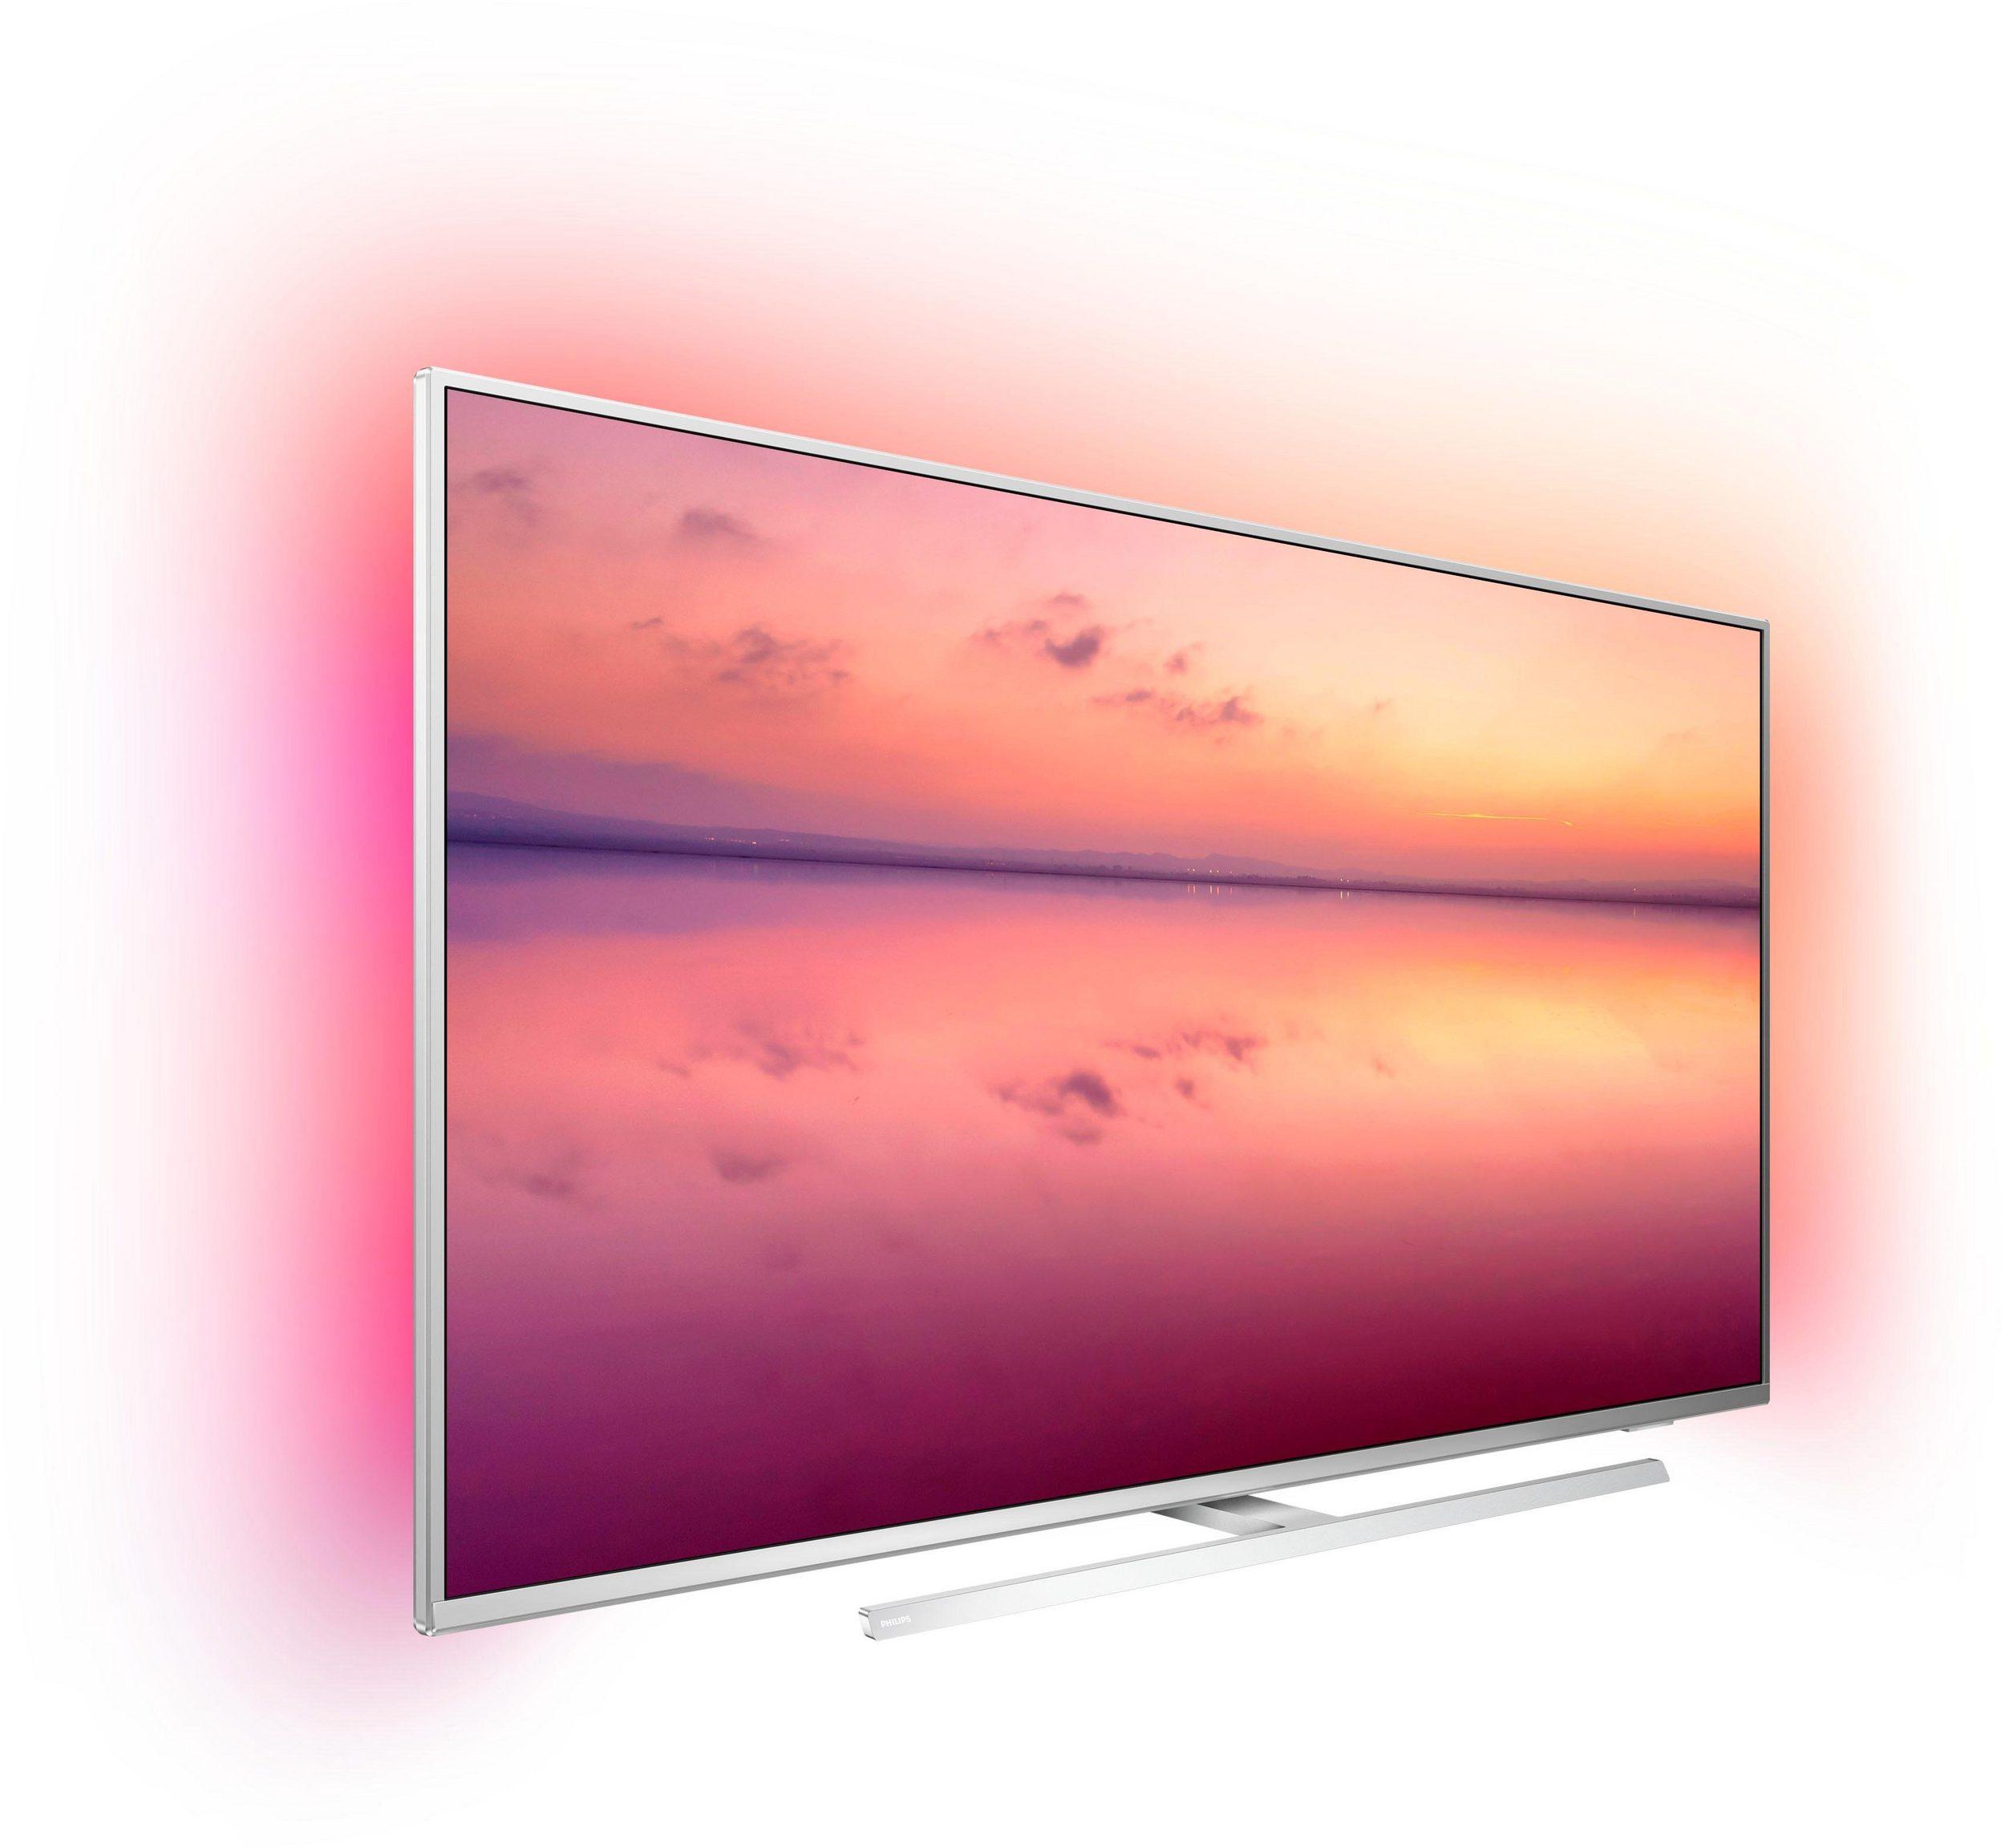 Philips 55PUS6804 LED-Fernseher - Philips